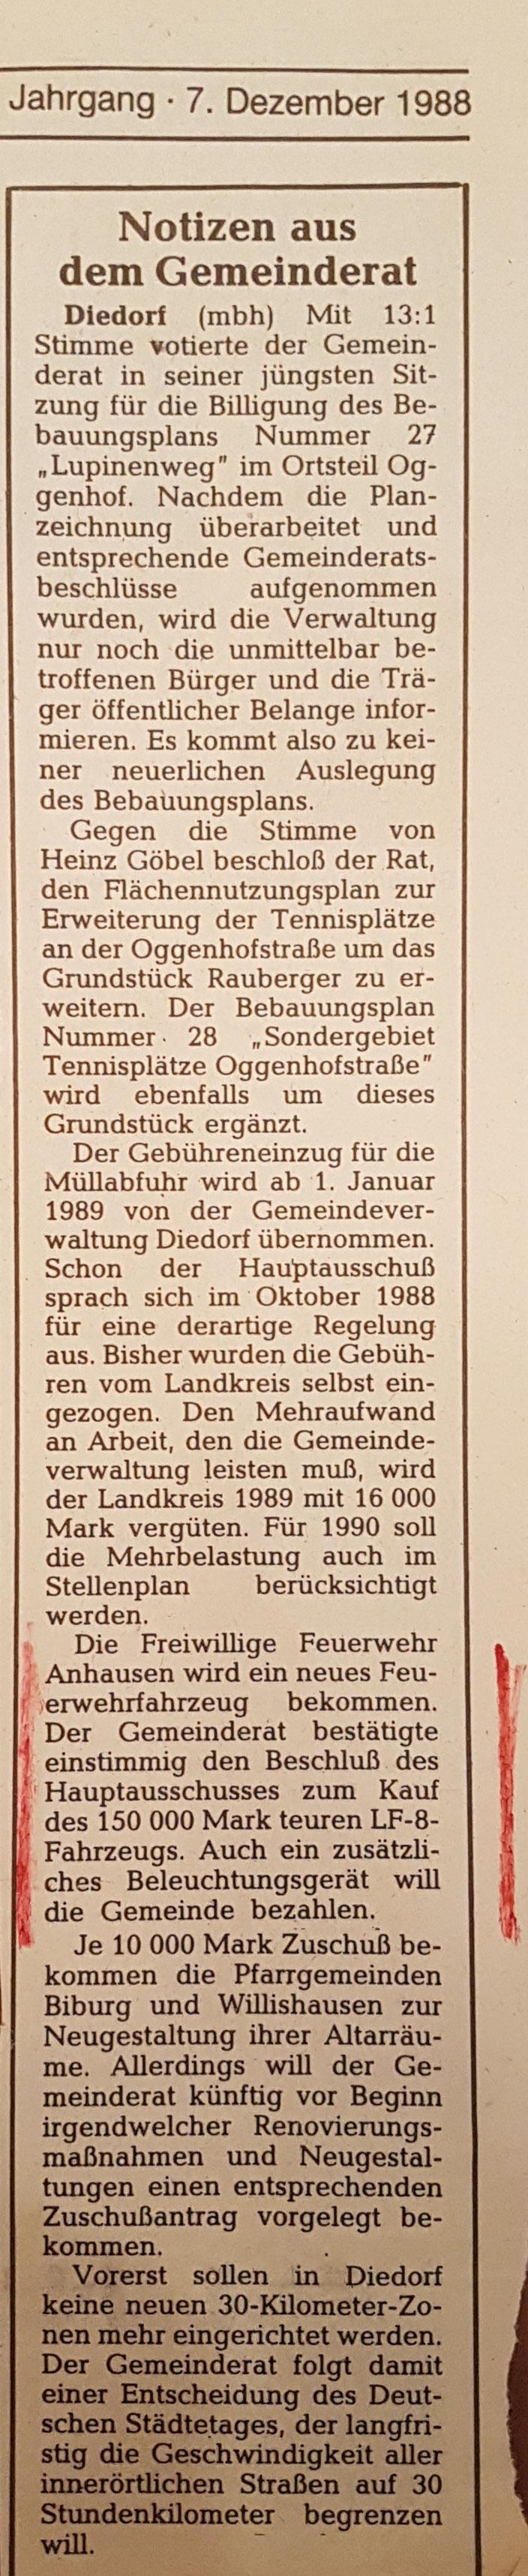 Neue Zeitung, 07. Dezember 1988